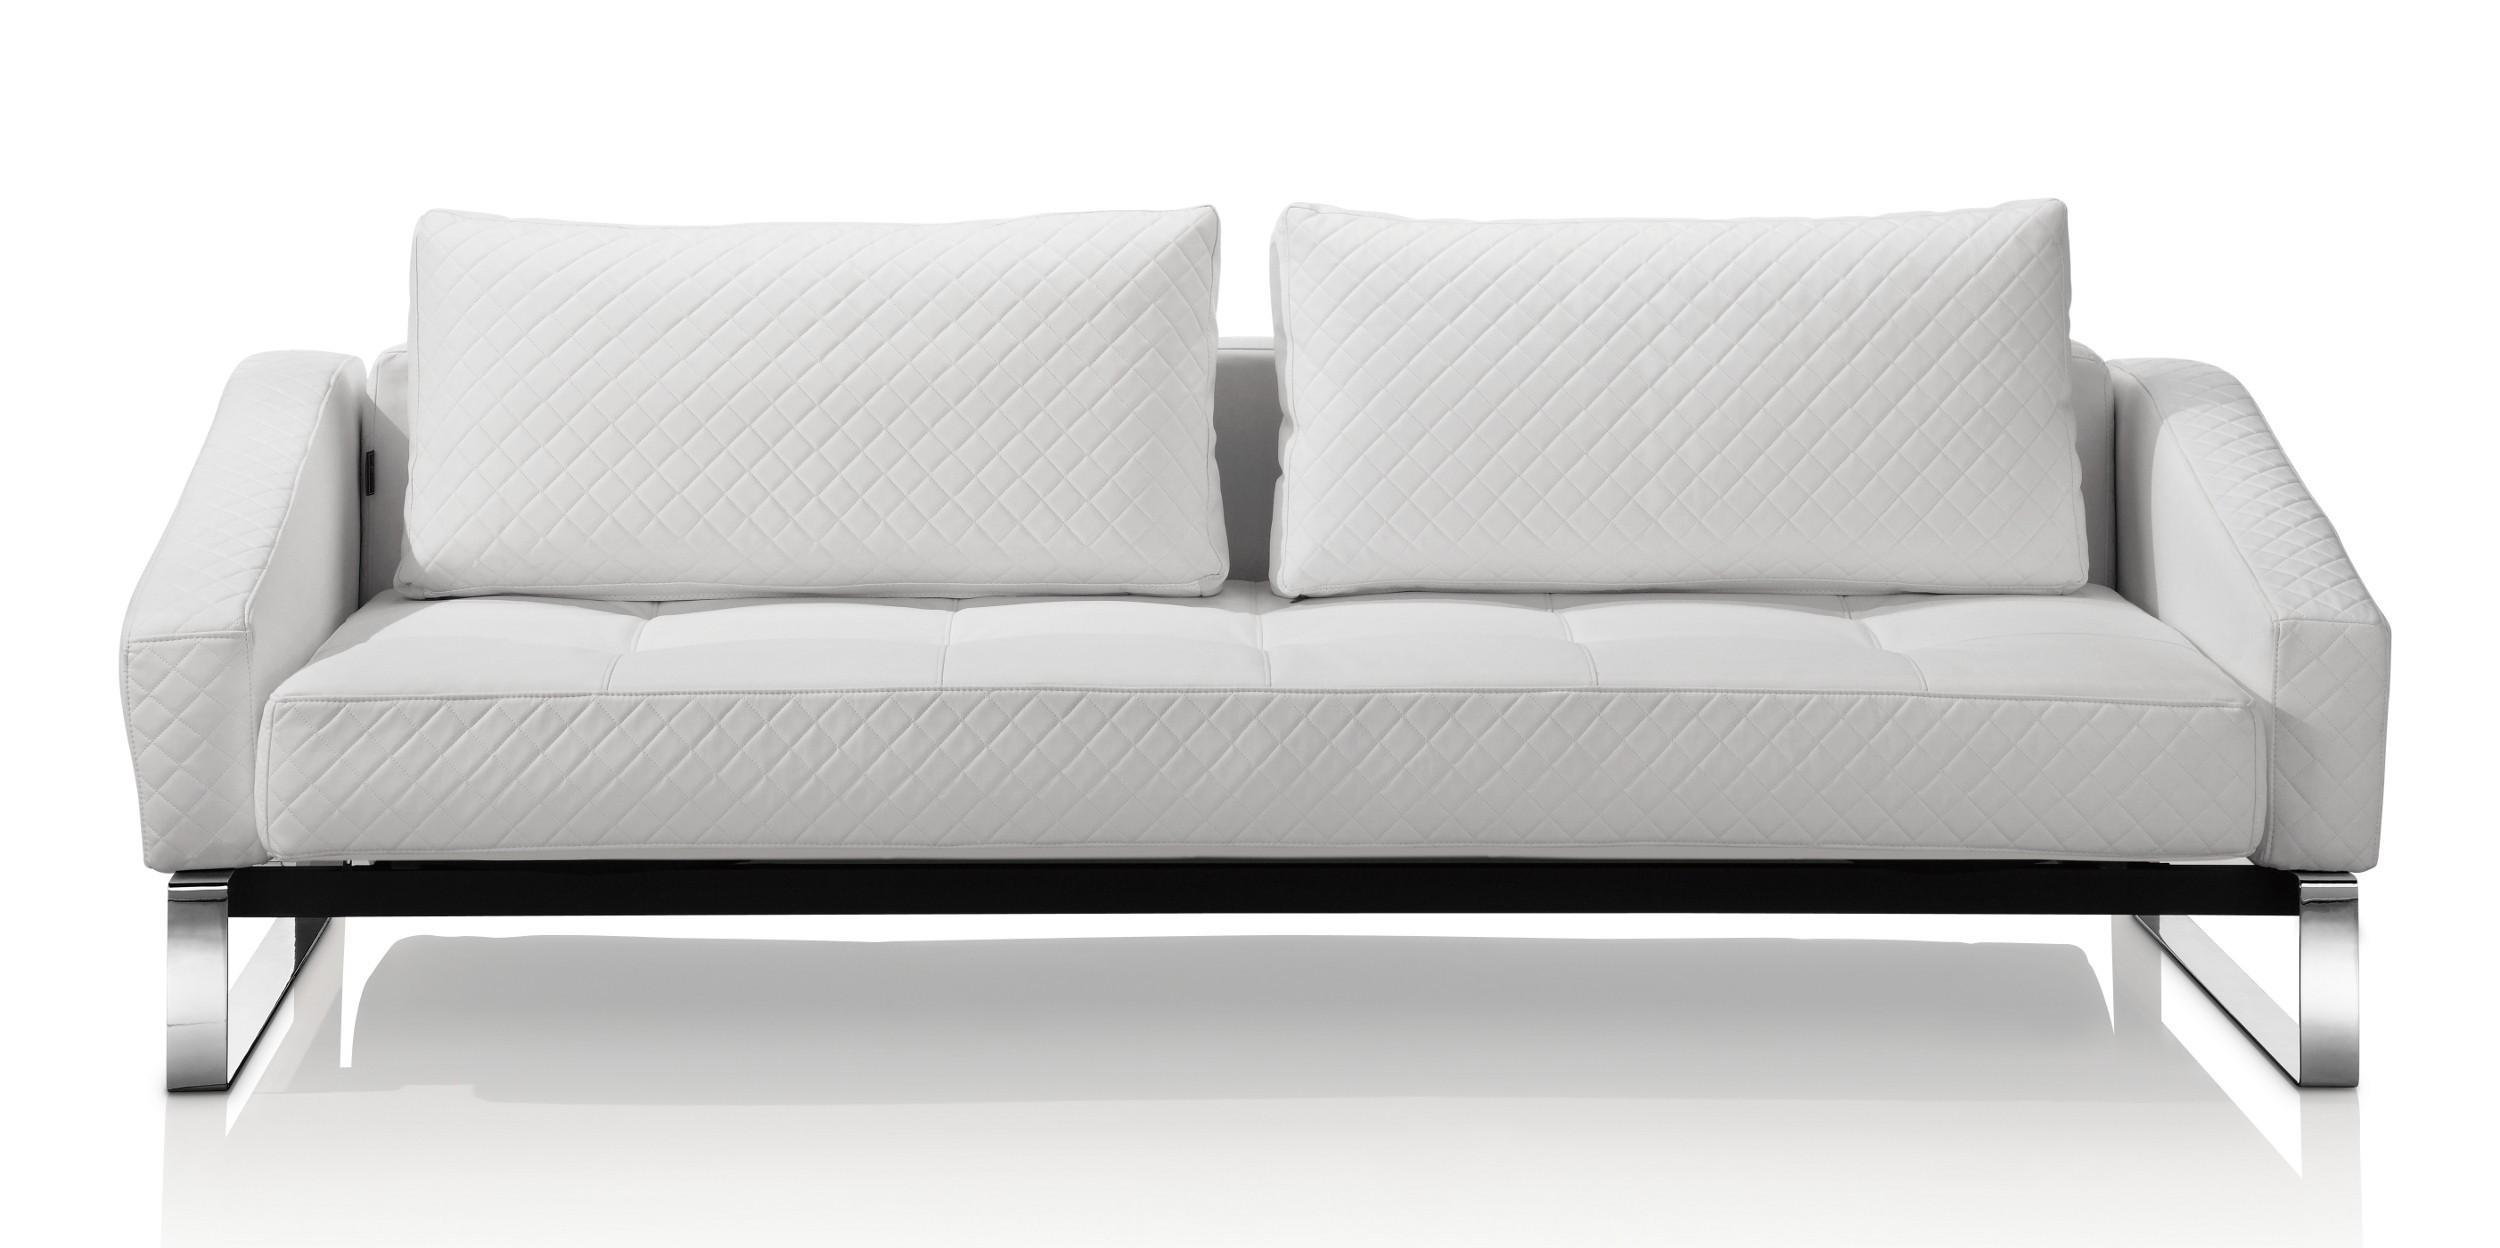 Sofas Center : Sleeper Sofa Modern Video And Photos Madlonsbigbear With Regard To Long Modern Sofas (Image 19 of 20)